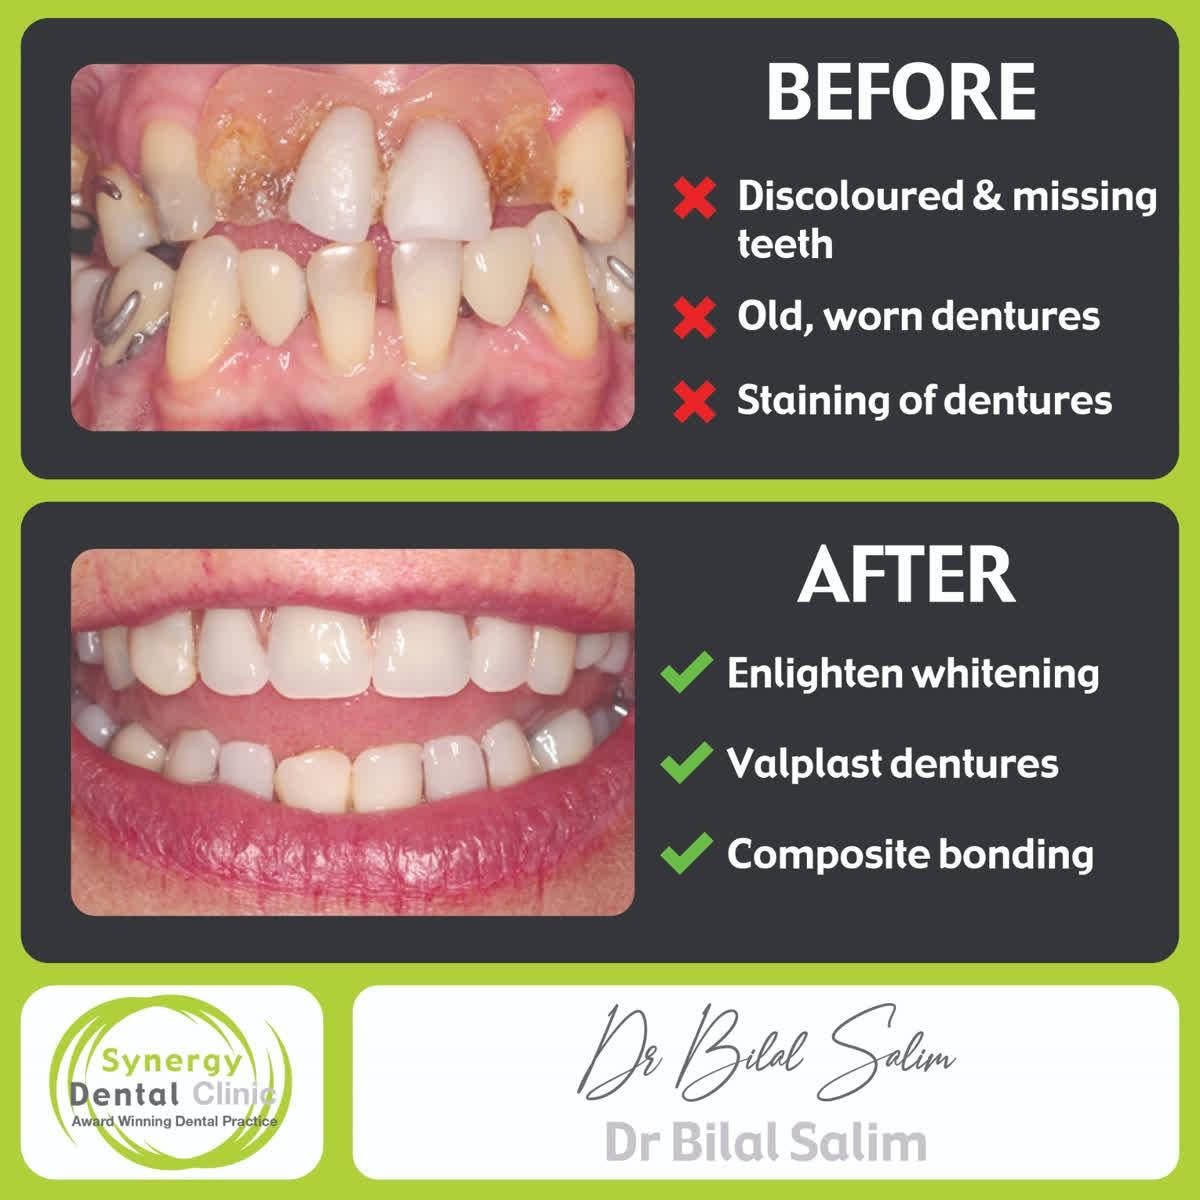 🌍 https://t.co/5pYuhYL7Ju  📱 Instagram - https://t.co/G2pNfgZG5S  🐦Twitter - SynergyDentist  🎥 Youtube - Synergy Dental Clinics  @enlightensmiles . . . . #toothwhitening #teethwhitening #smilemakeover #dentist #transformation #dentalphotography #cosmetics #makeupartist #fff https://t.co/QG7mn3Zu54